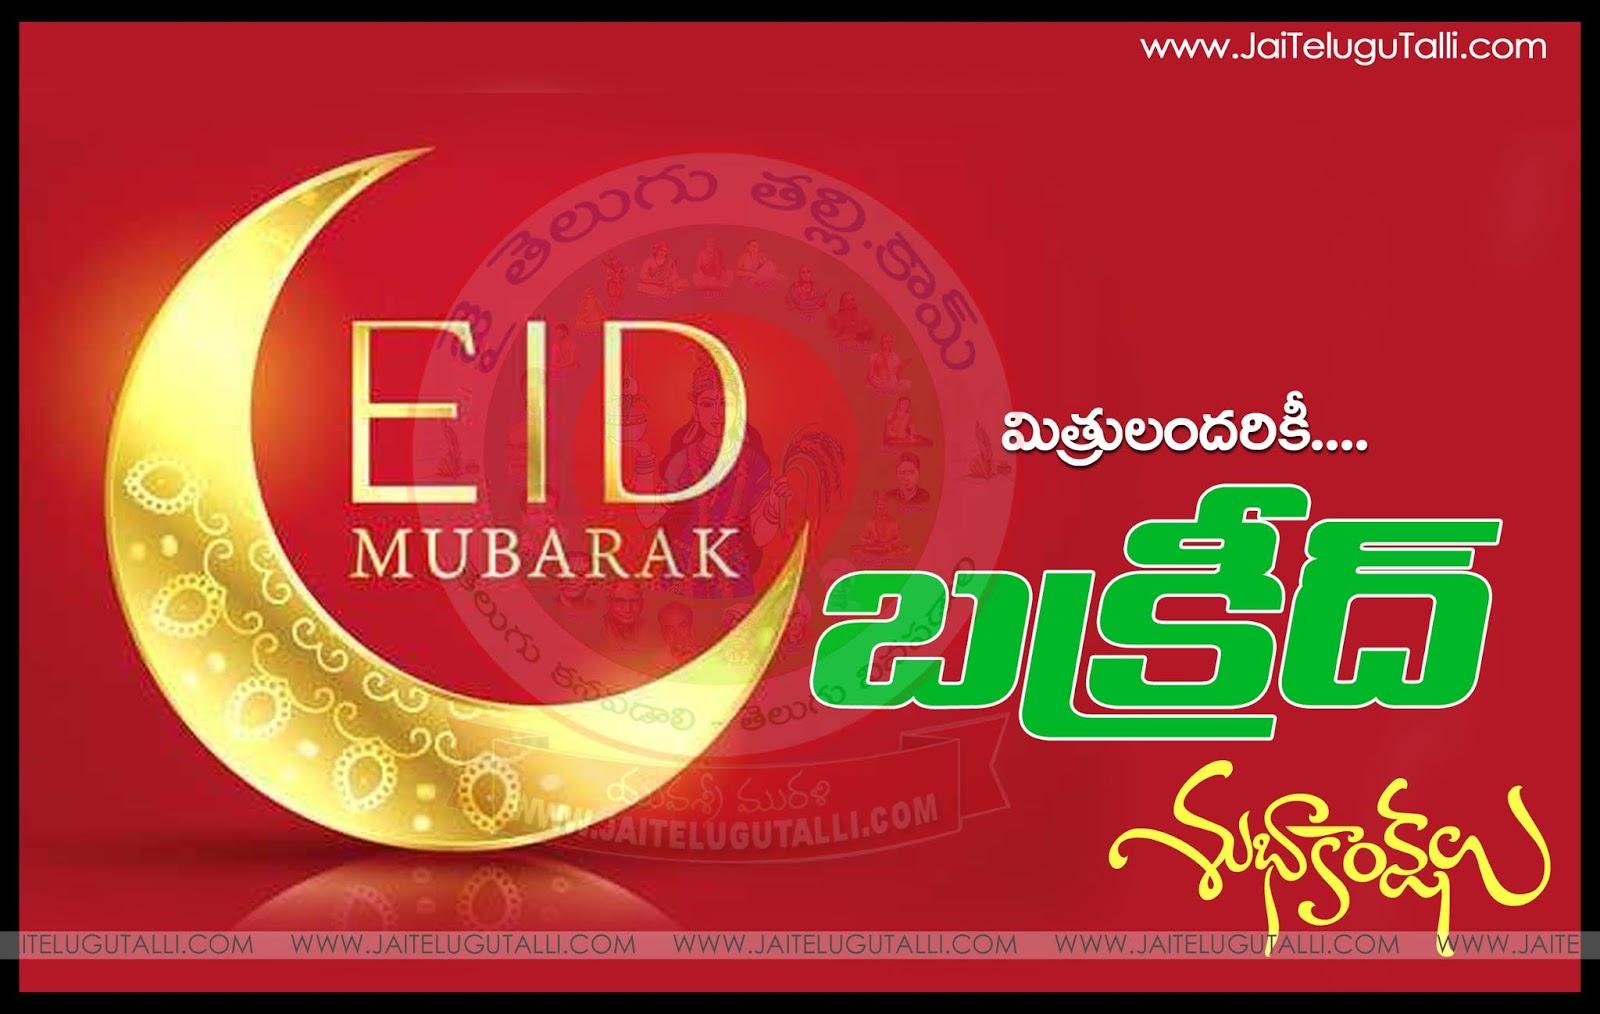 Famous happy bakri eid greetings in telugu hd wallpapers best bakrid happy barkrid 2017 images top bakrid greetings whatsapp m4hsunfo